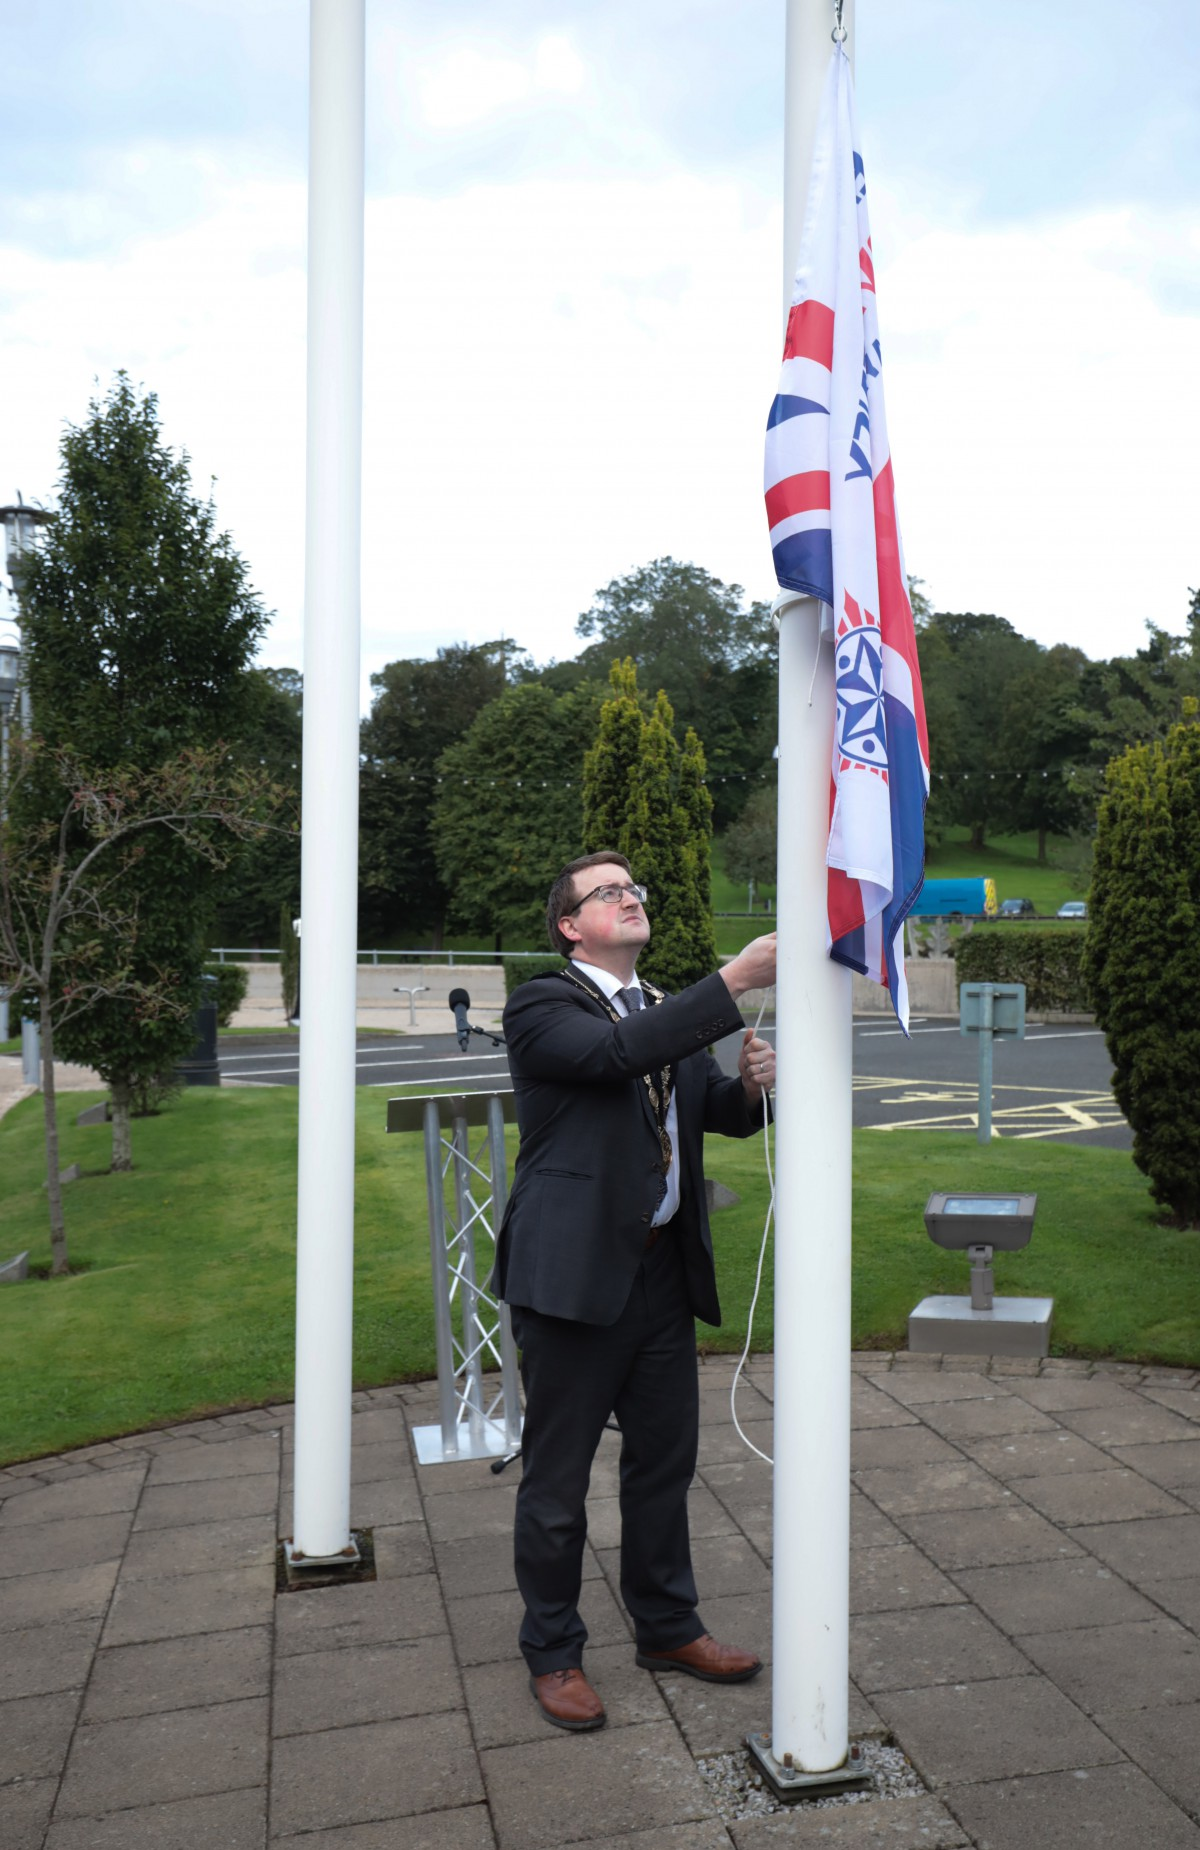 The Mayor, Councillor Nicholas Trimble raising the 999 Emergency Services Flag